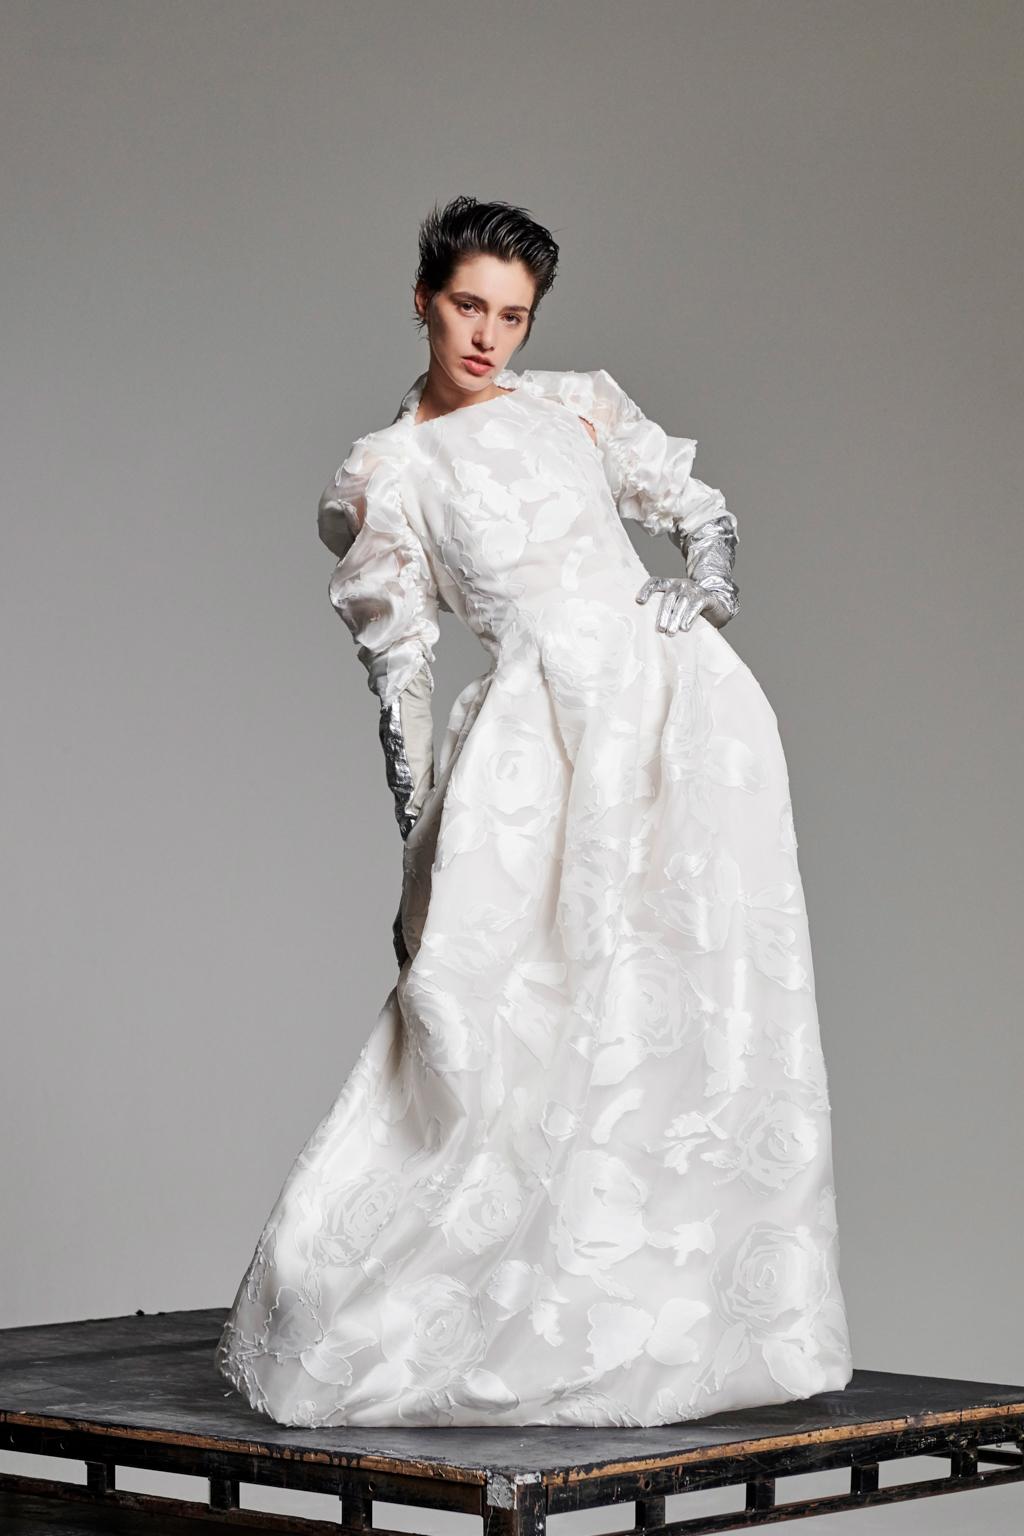 Viviene Westwood Wedding Dresses.Bridal Made To Order Collections Bridal Vivienne Westwood